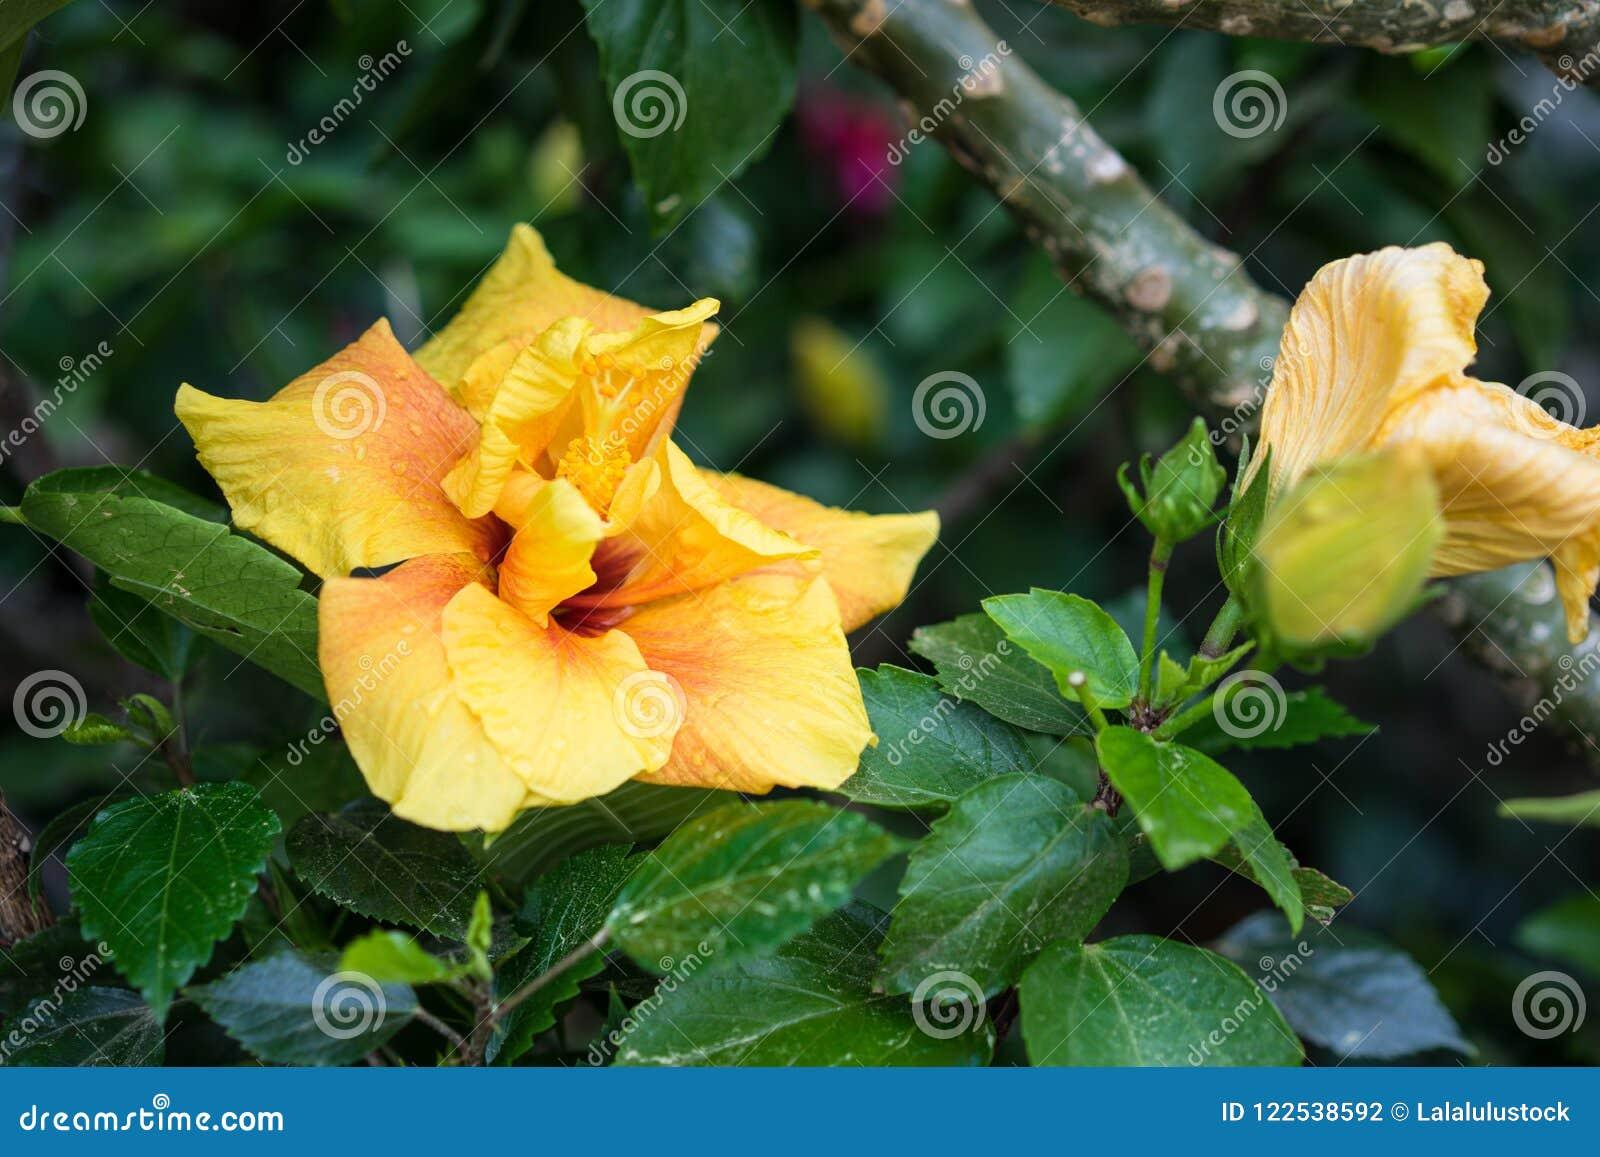 Orange Yellow Flower Bud Close Up With Small Rain Drops Stock Photo